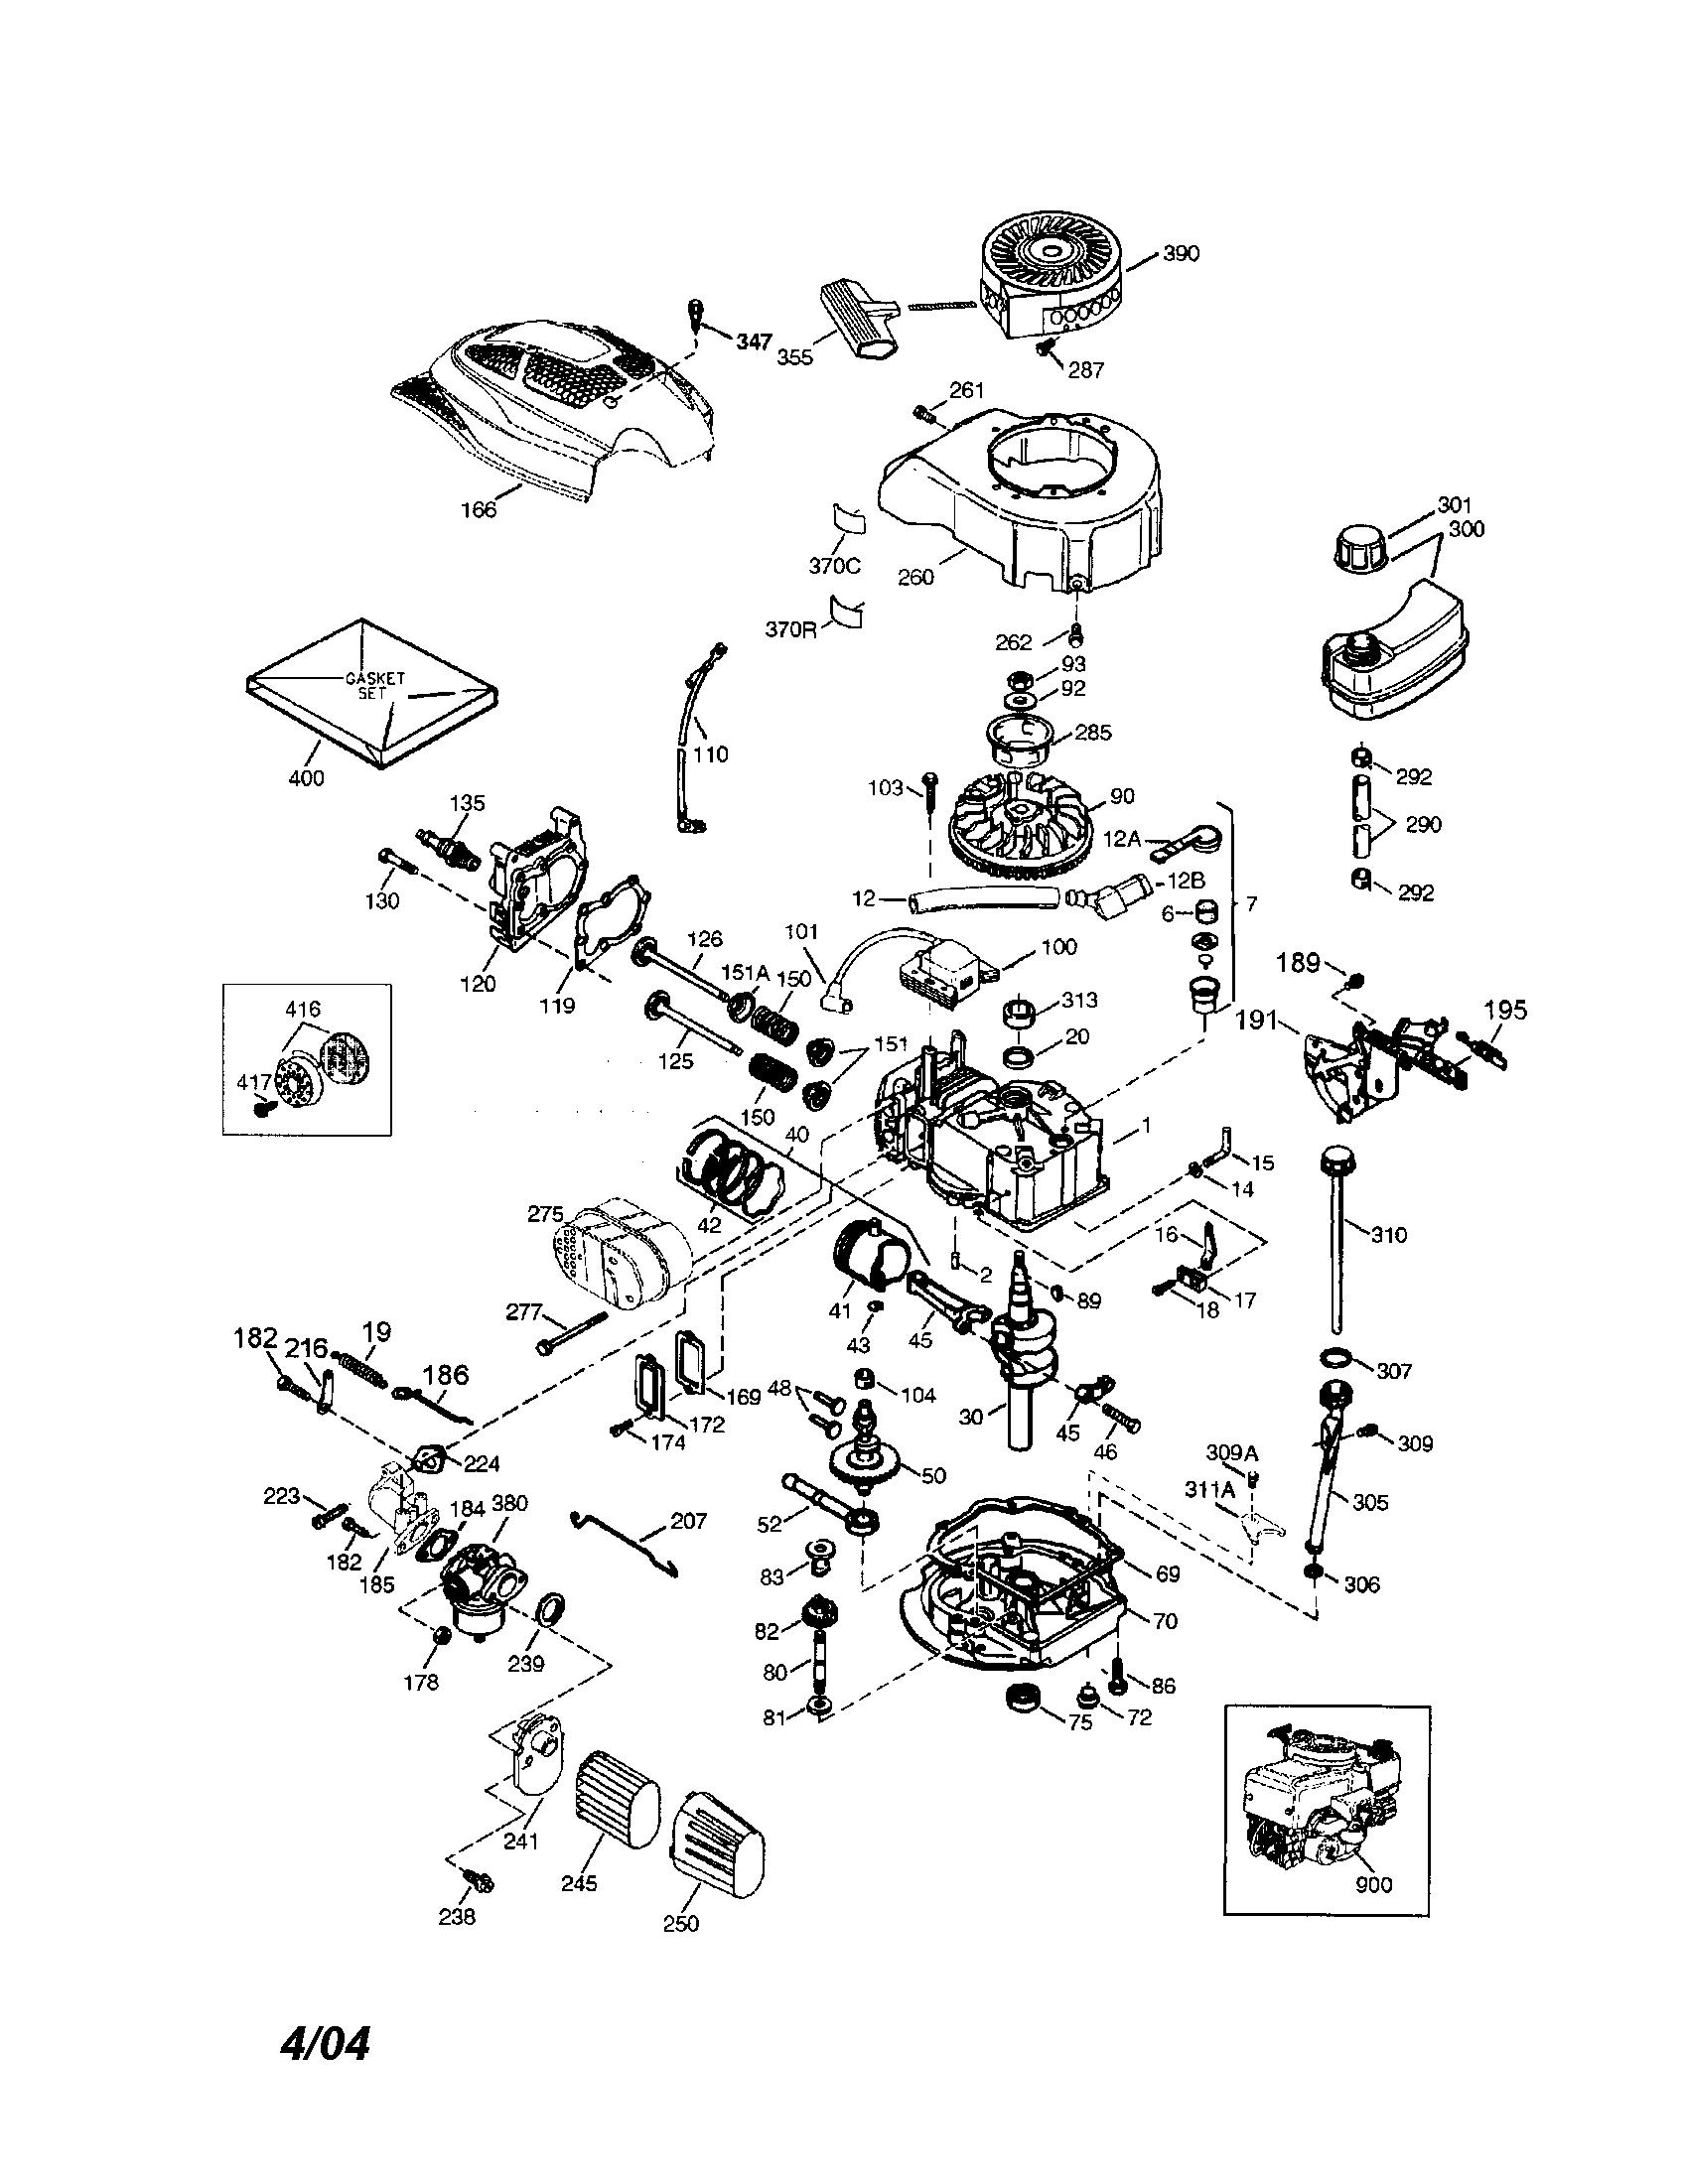 Tecumseh Engine Model 2068570 C Manual